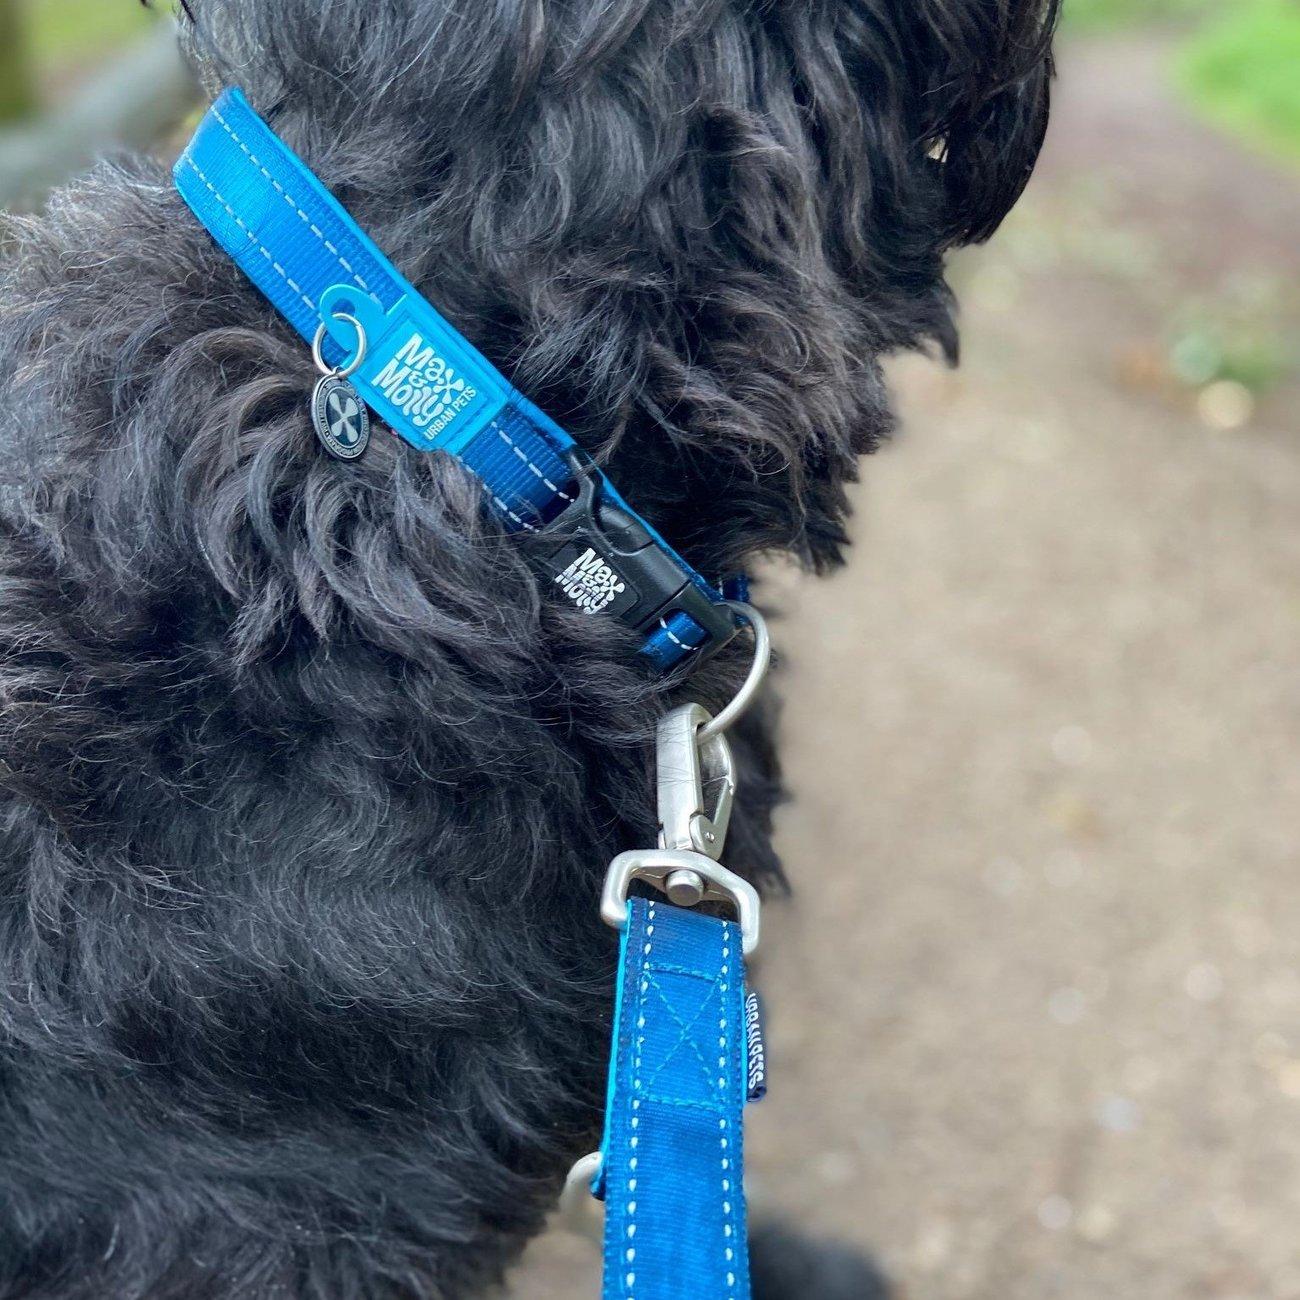 Max & Molly Matrix Smart ID Hundehalsband Bild 5